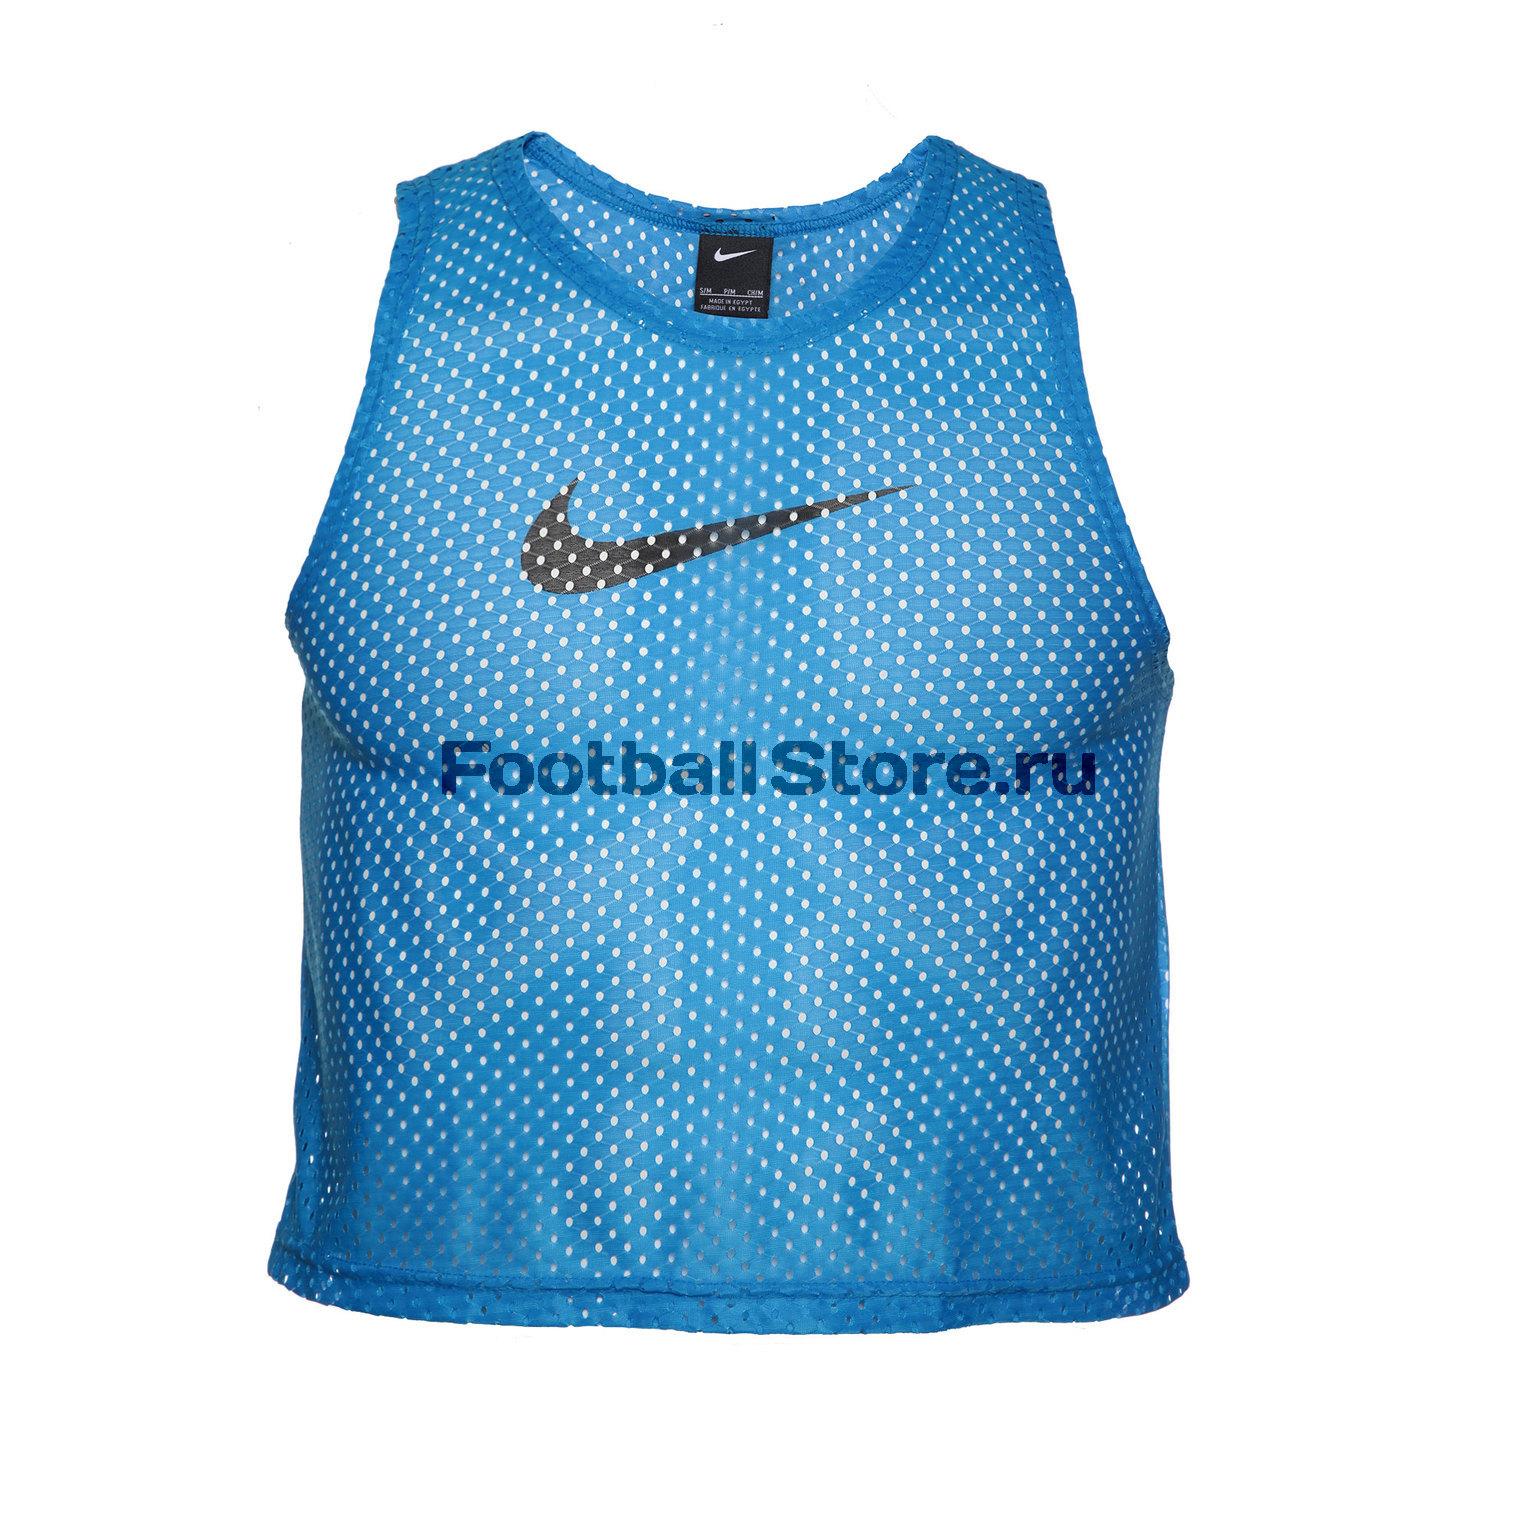 Манишка Nike training bib 725876-406 манишка adidas bib f82134